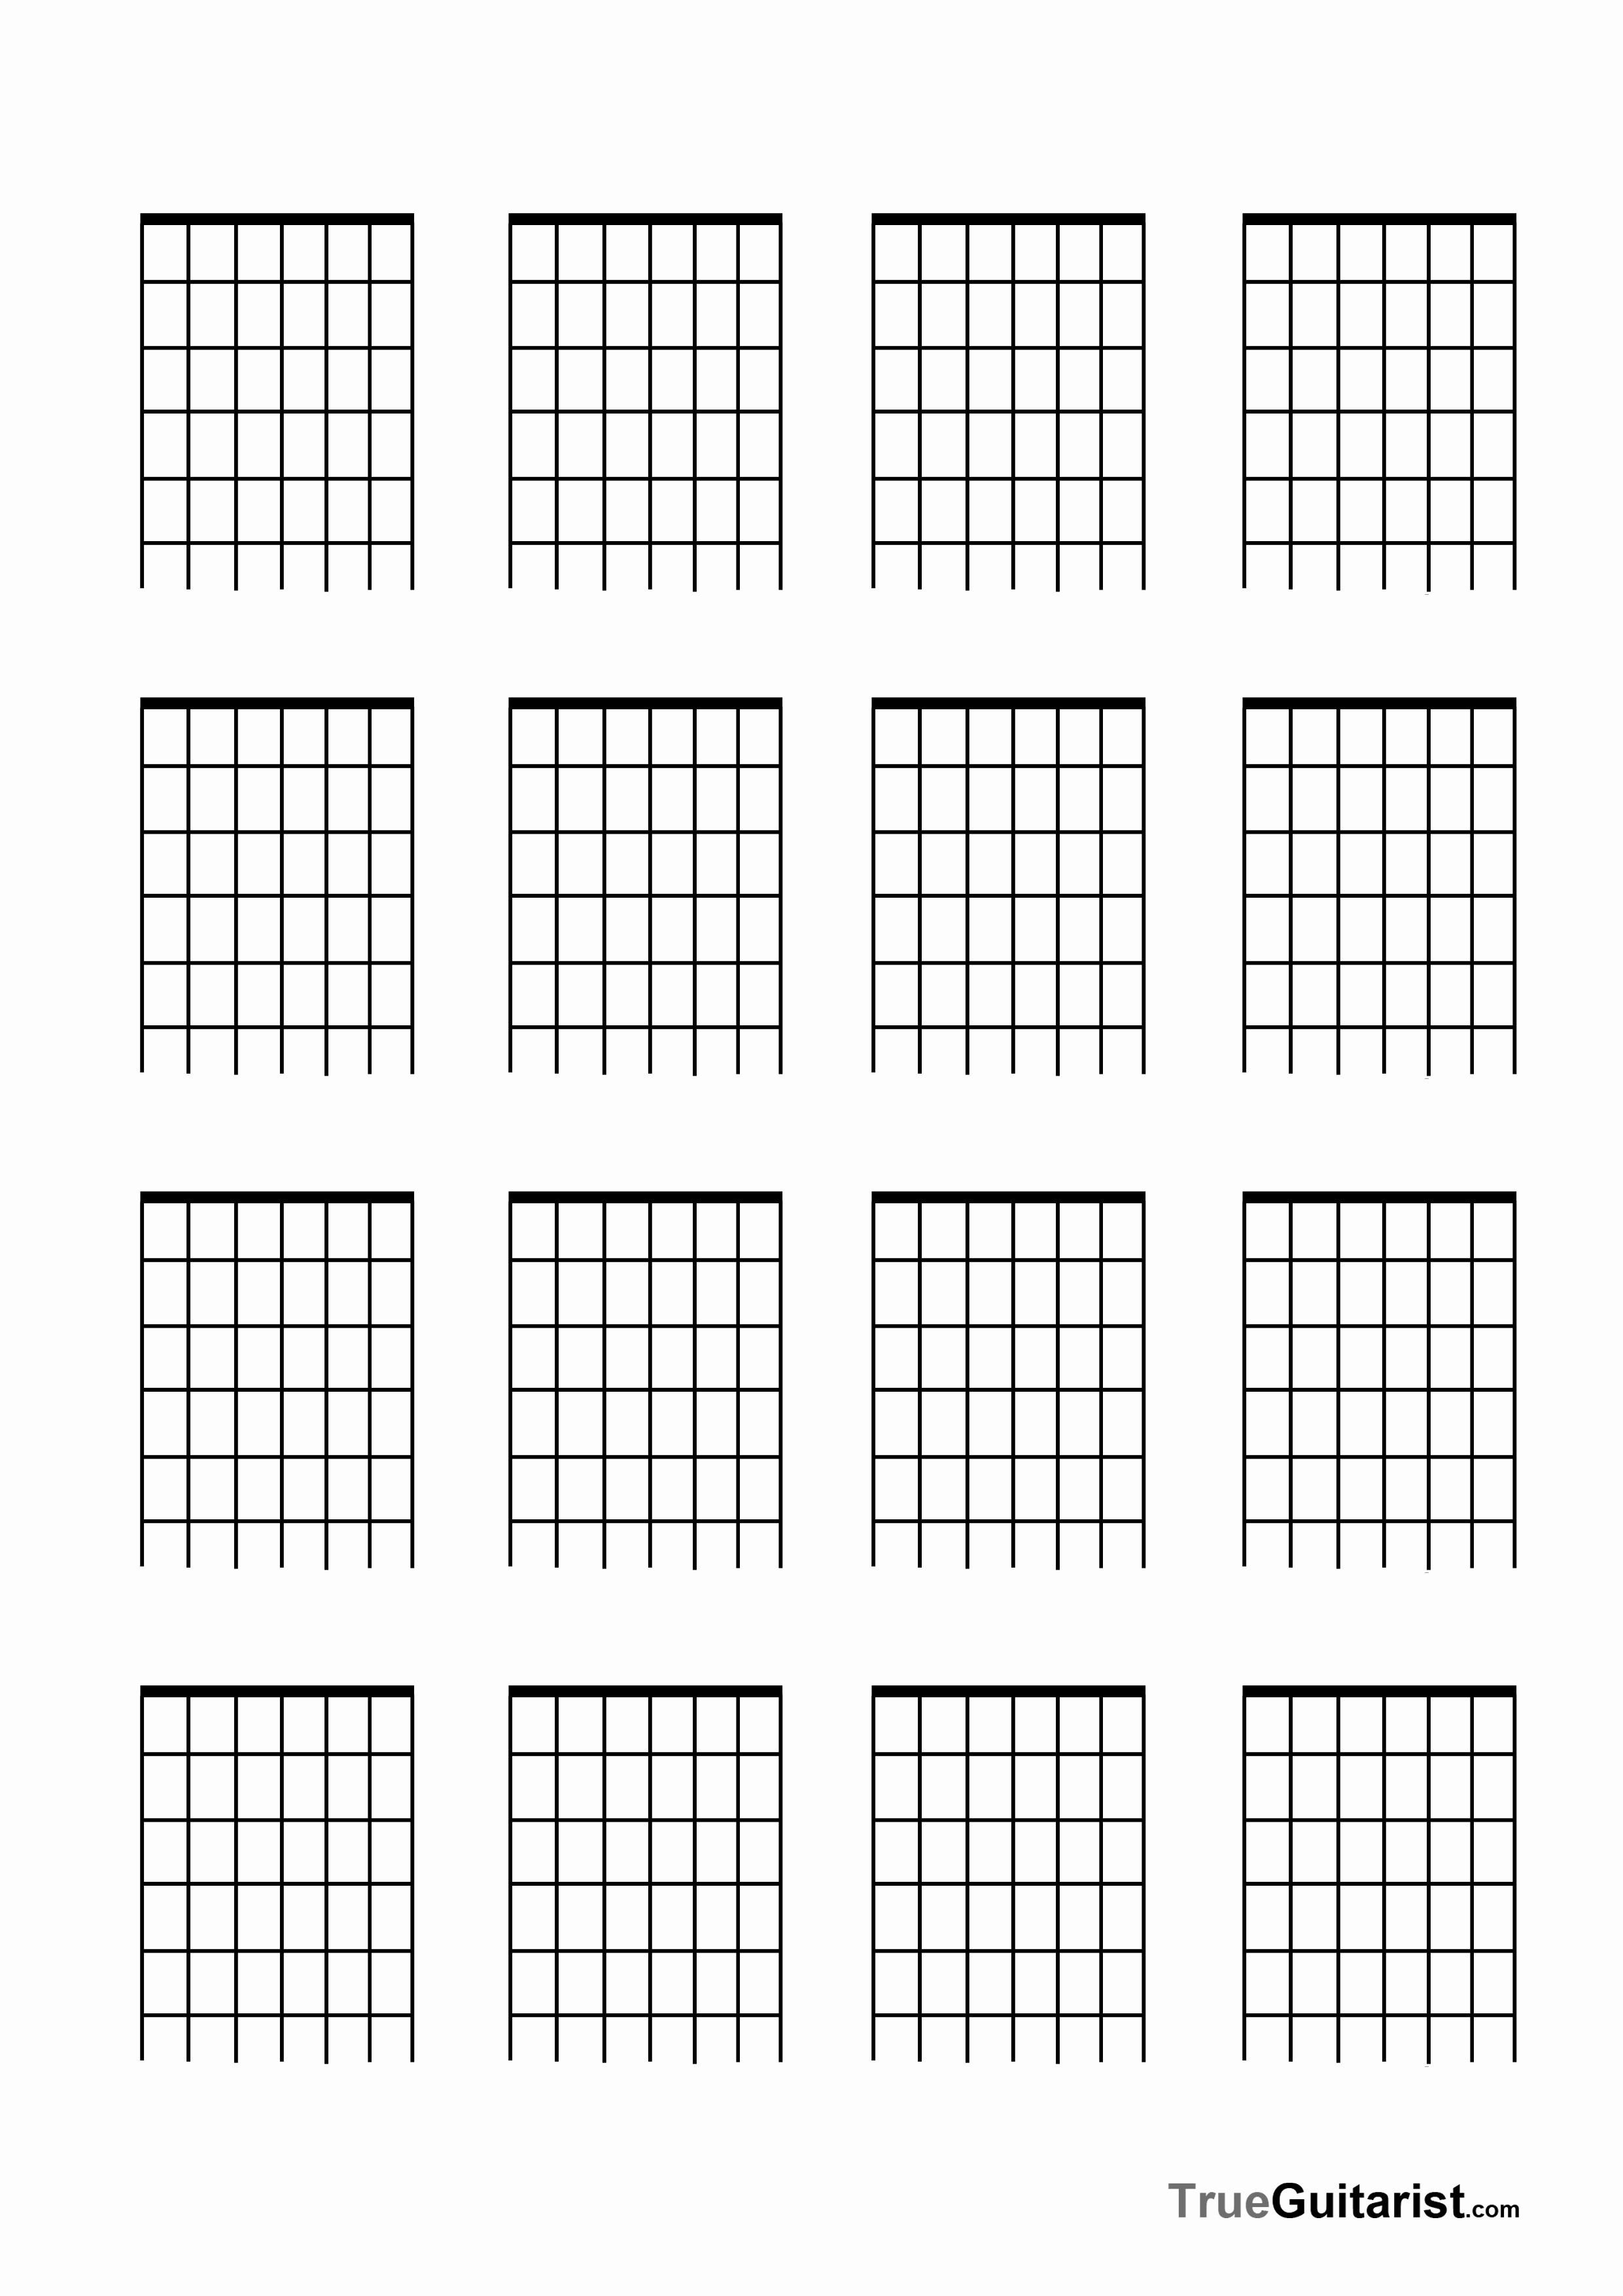 Free Printable Blank Guitar Chord Charts